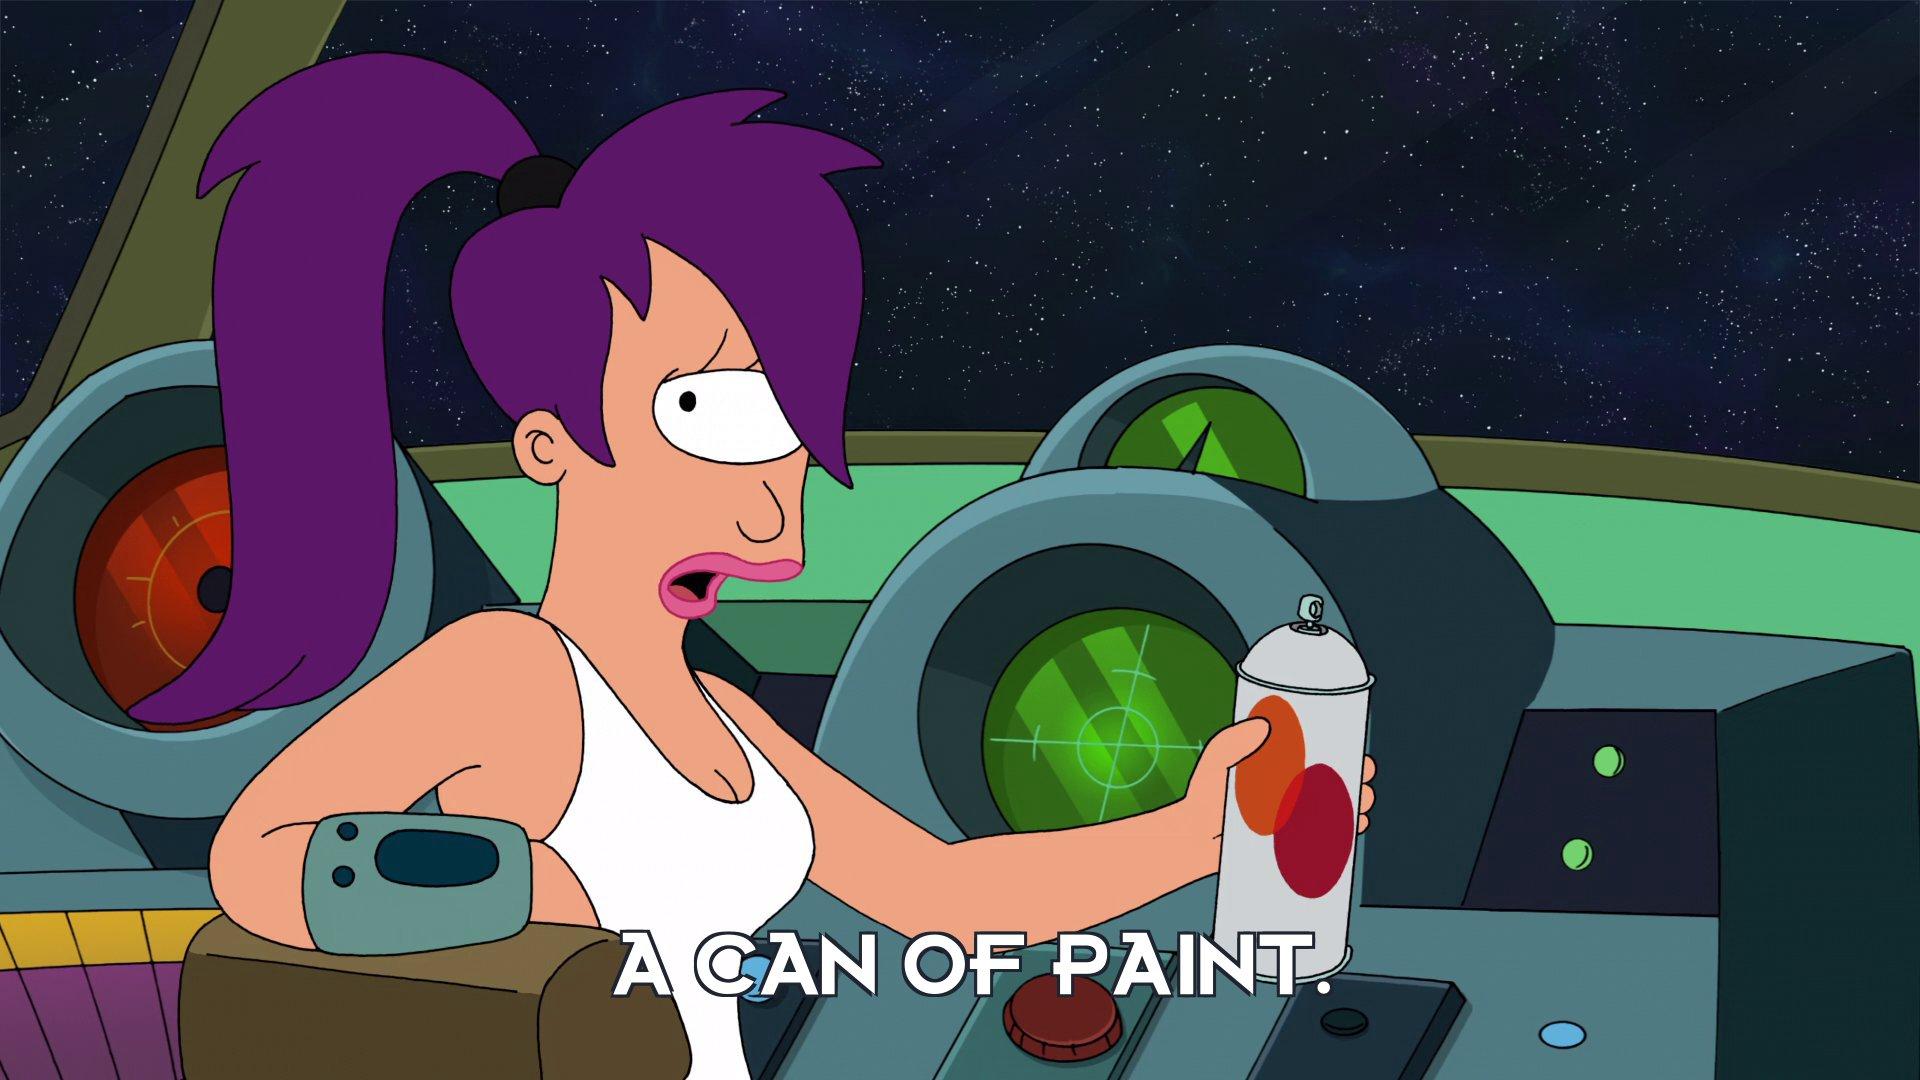 Turanga Leela: A can of paint.